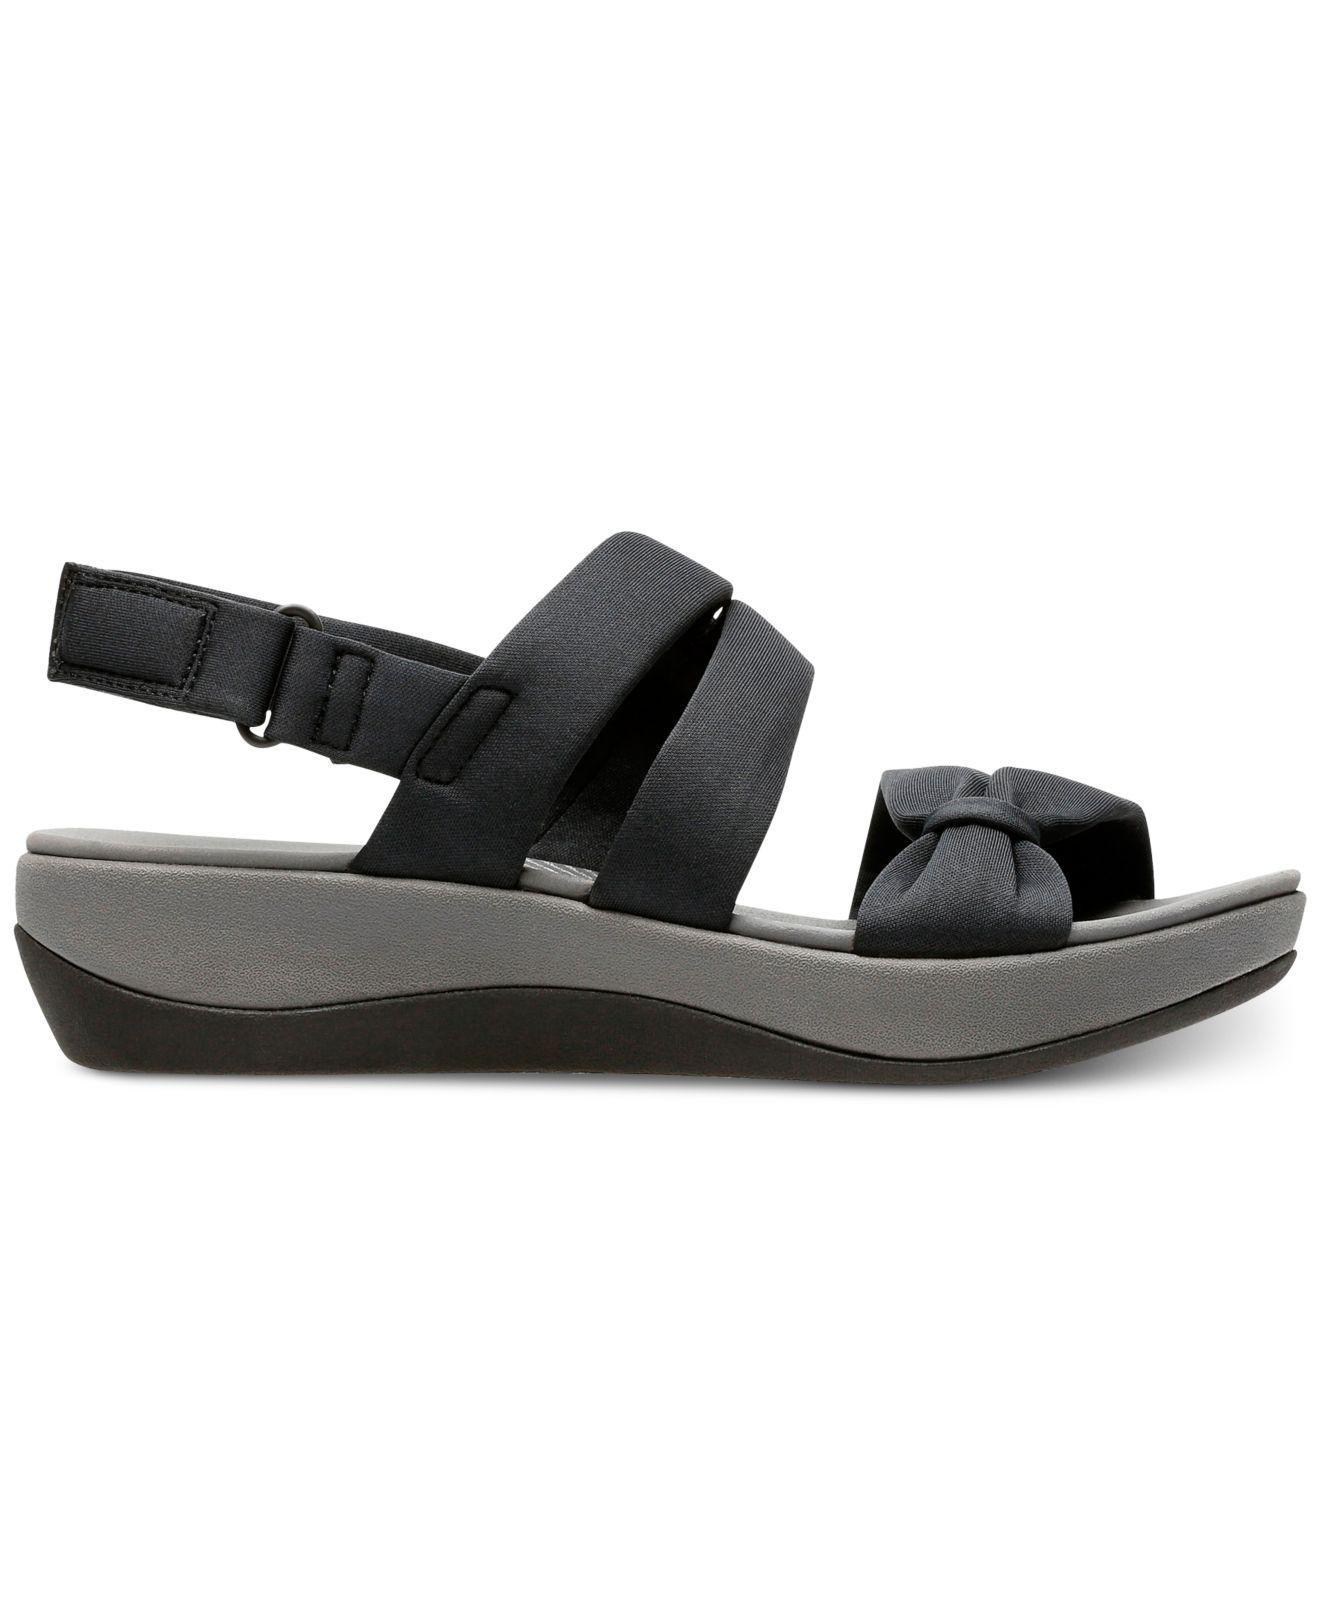 971ffb682134 Lyst - Clarks Cloudsteppers Arla Mae Wedge Sandals in Black